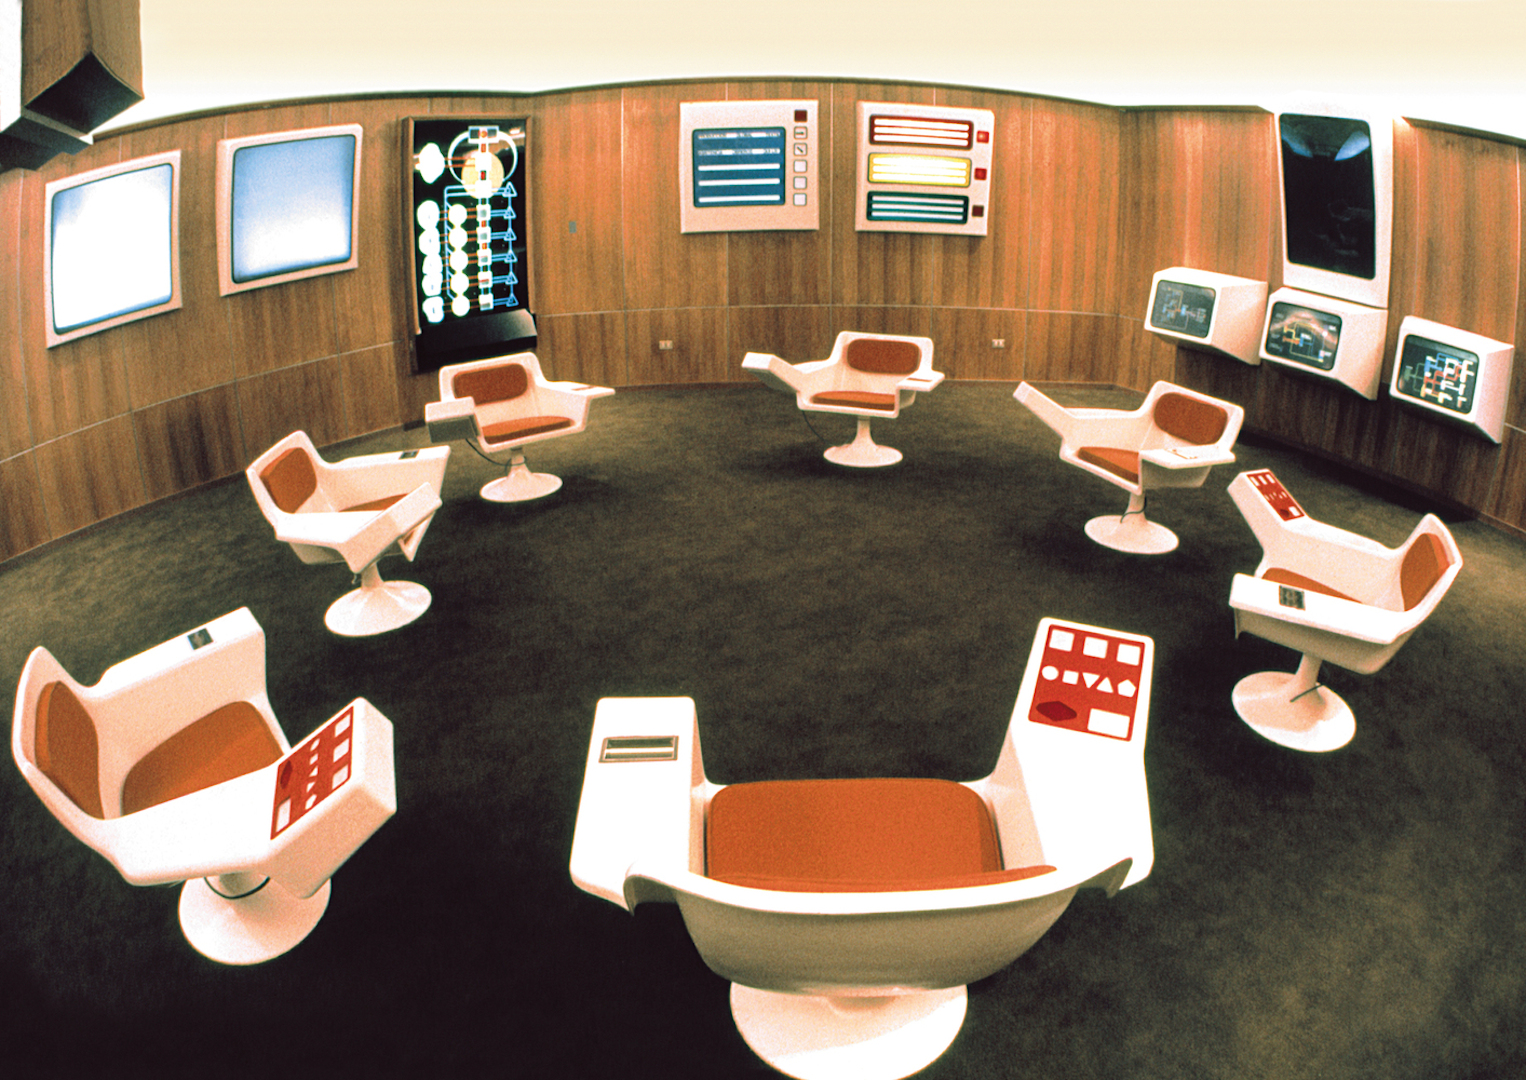 JPGChile-The-Cybersyn-Operations-Room_historic-picture_©-Gui-Bonsiepe.jpg